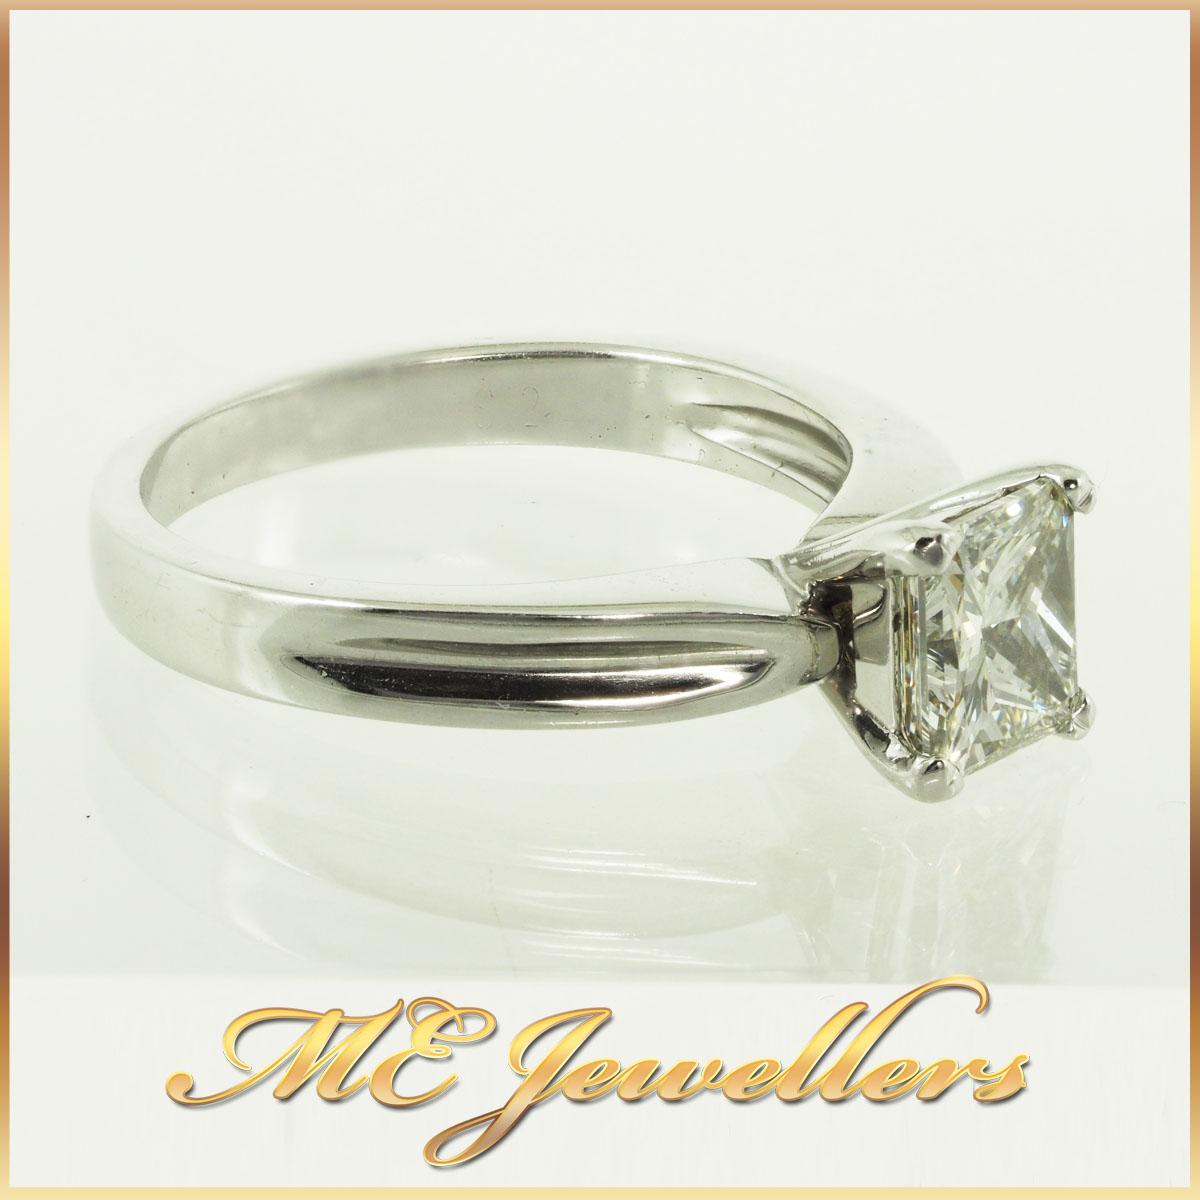 287 1.09Ct K/SI1 Princess Cut Engagement Ring 5